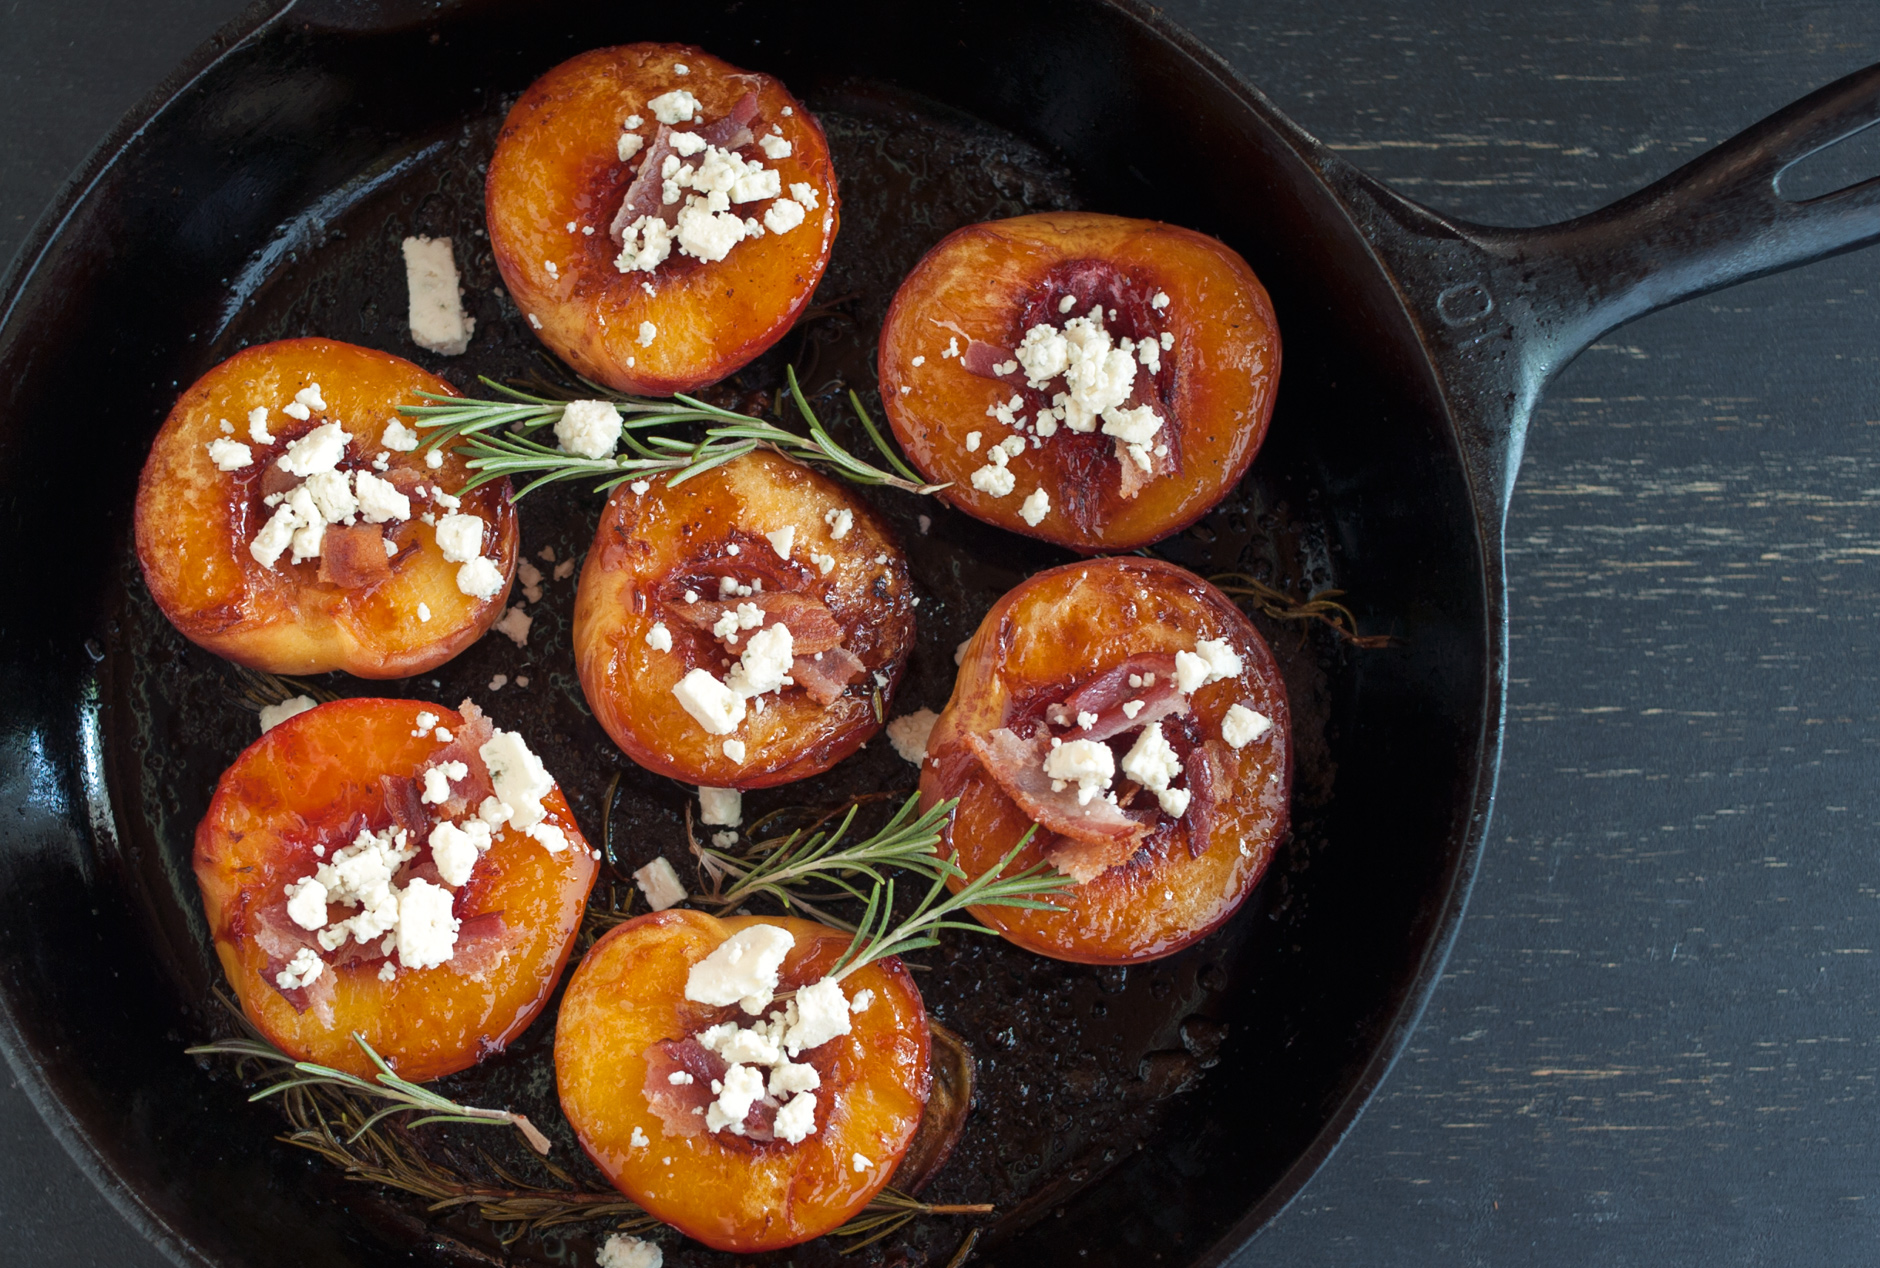 roasted_peaches_food_photography_2.jpg